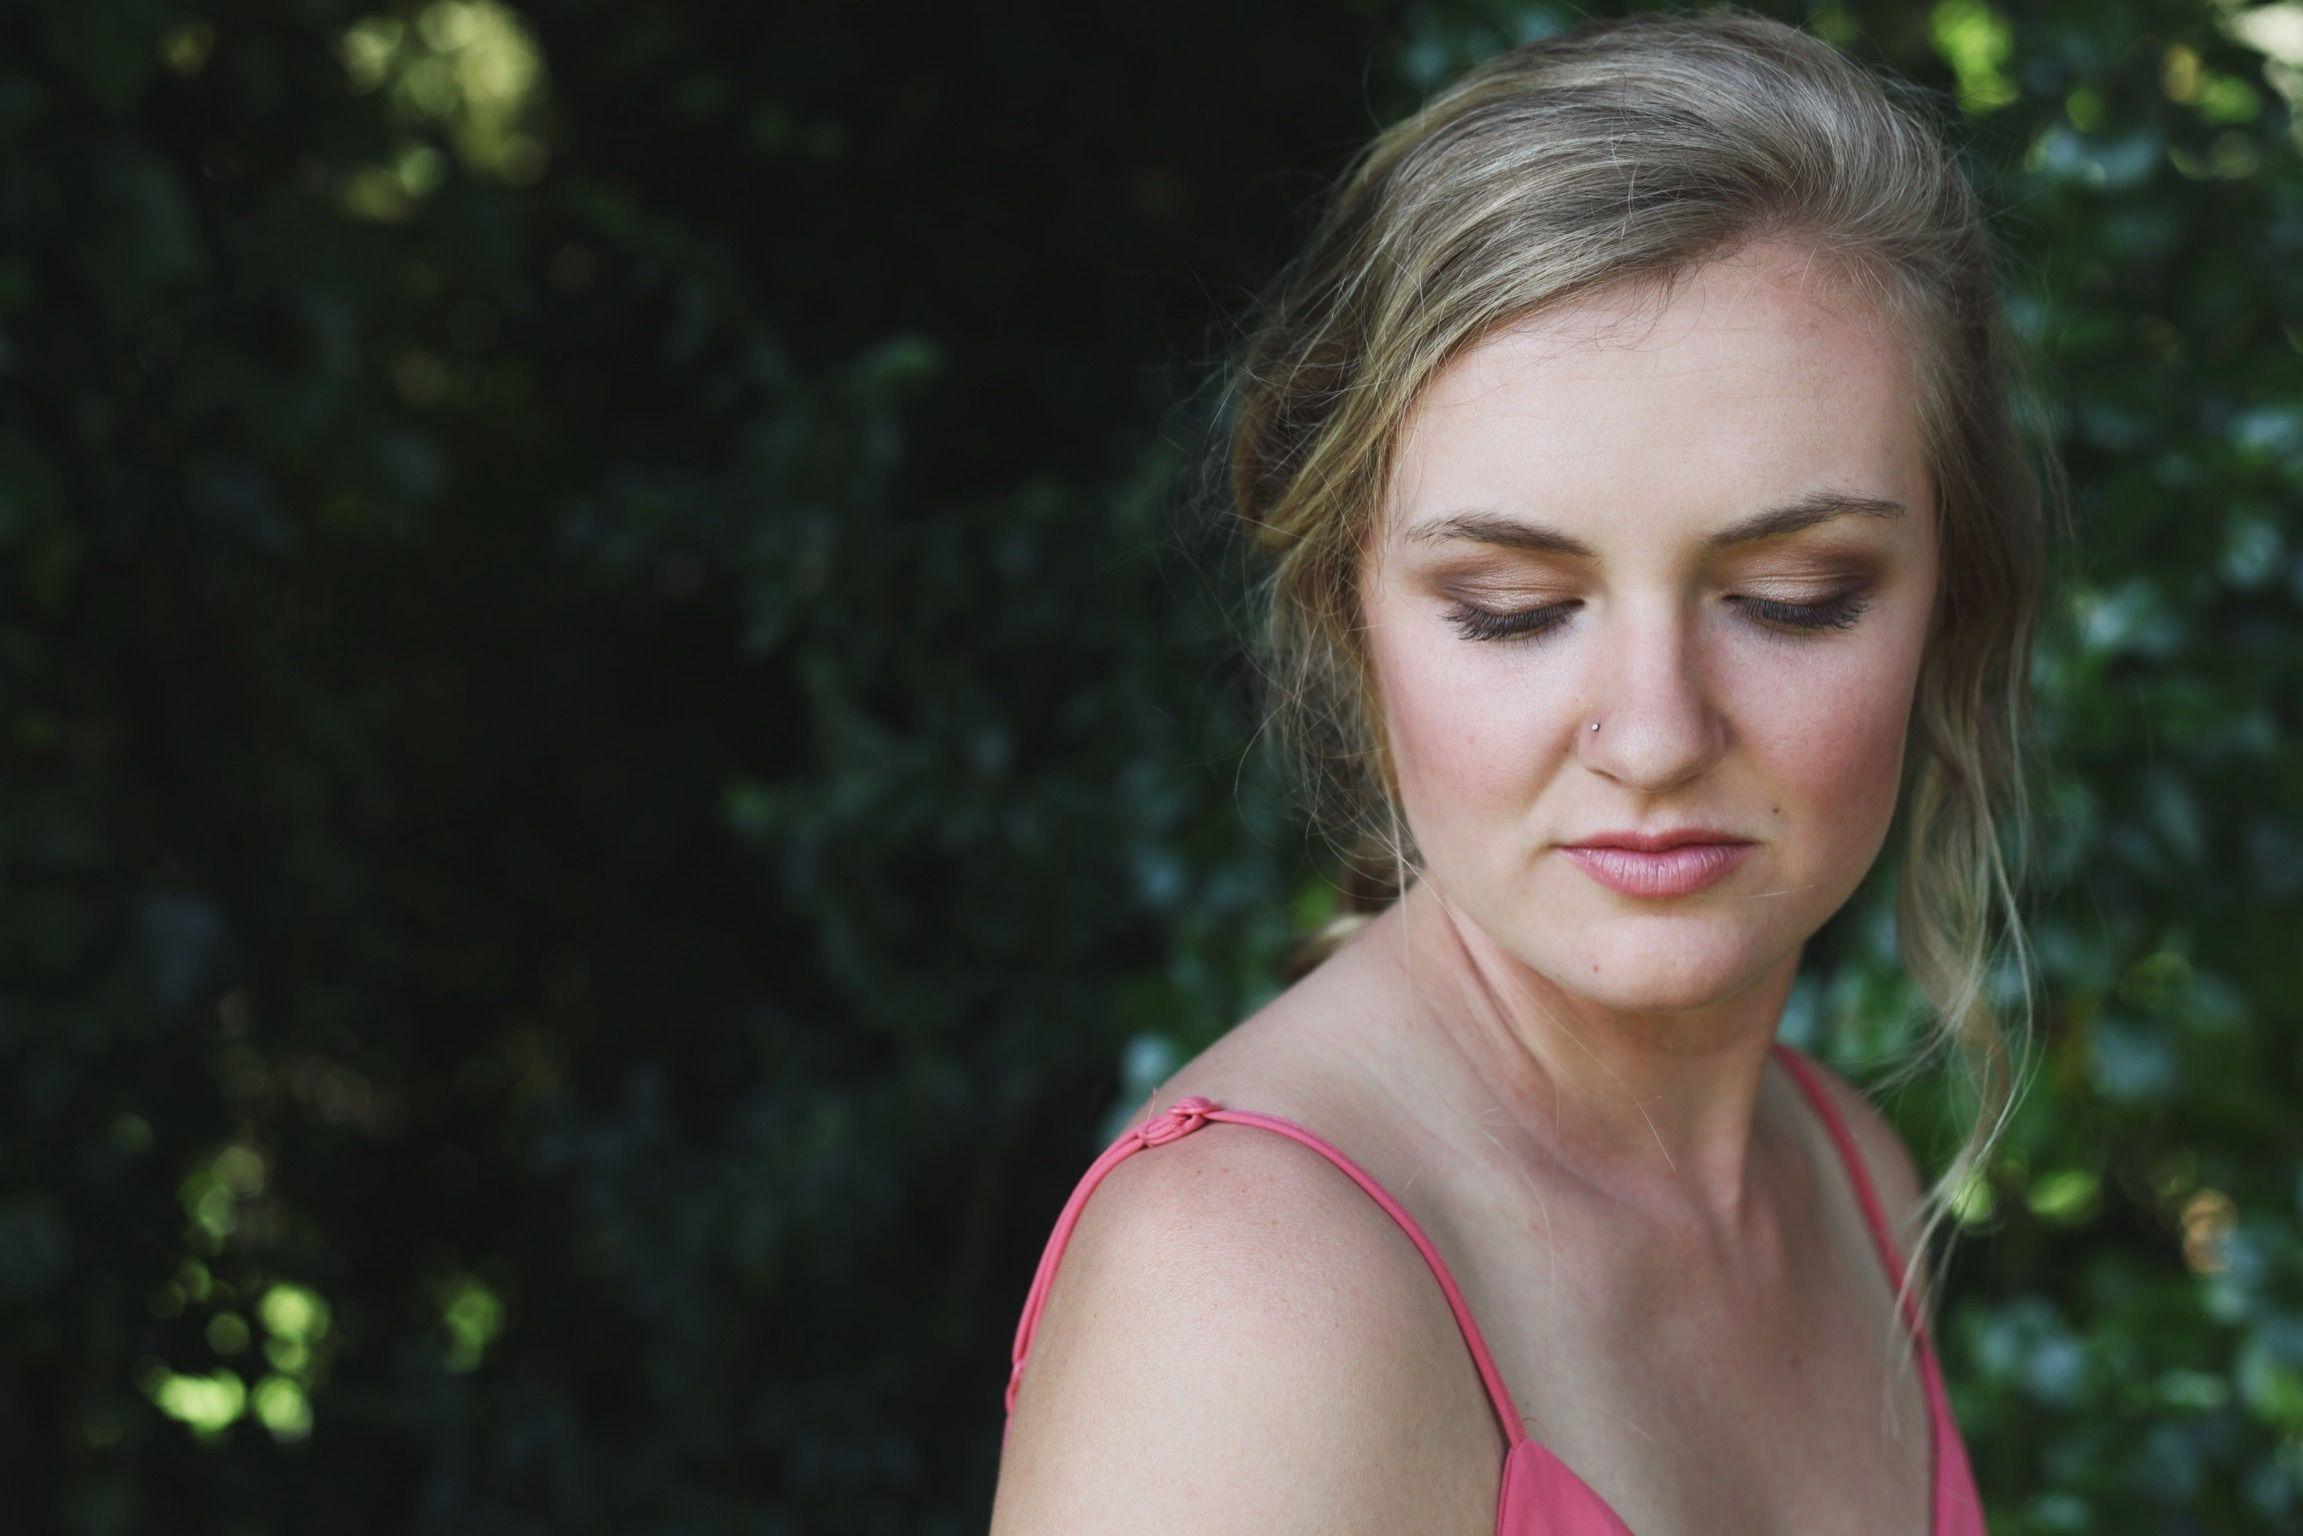 Jess makeup artistry.  Tauranga, NZ based makeup artist.